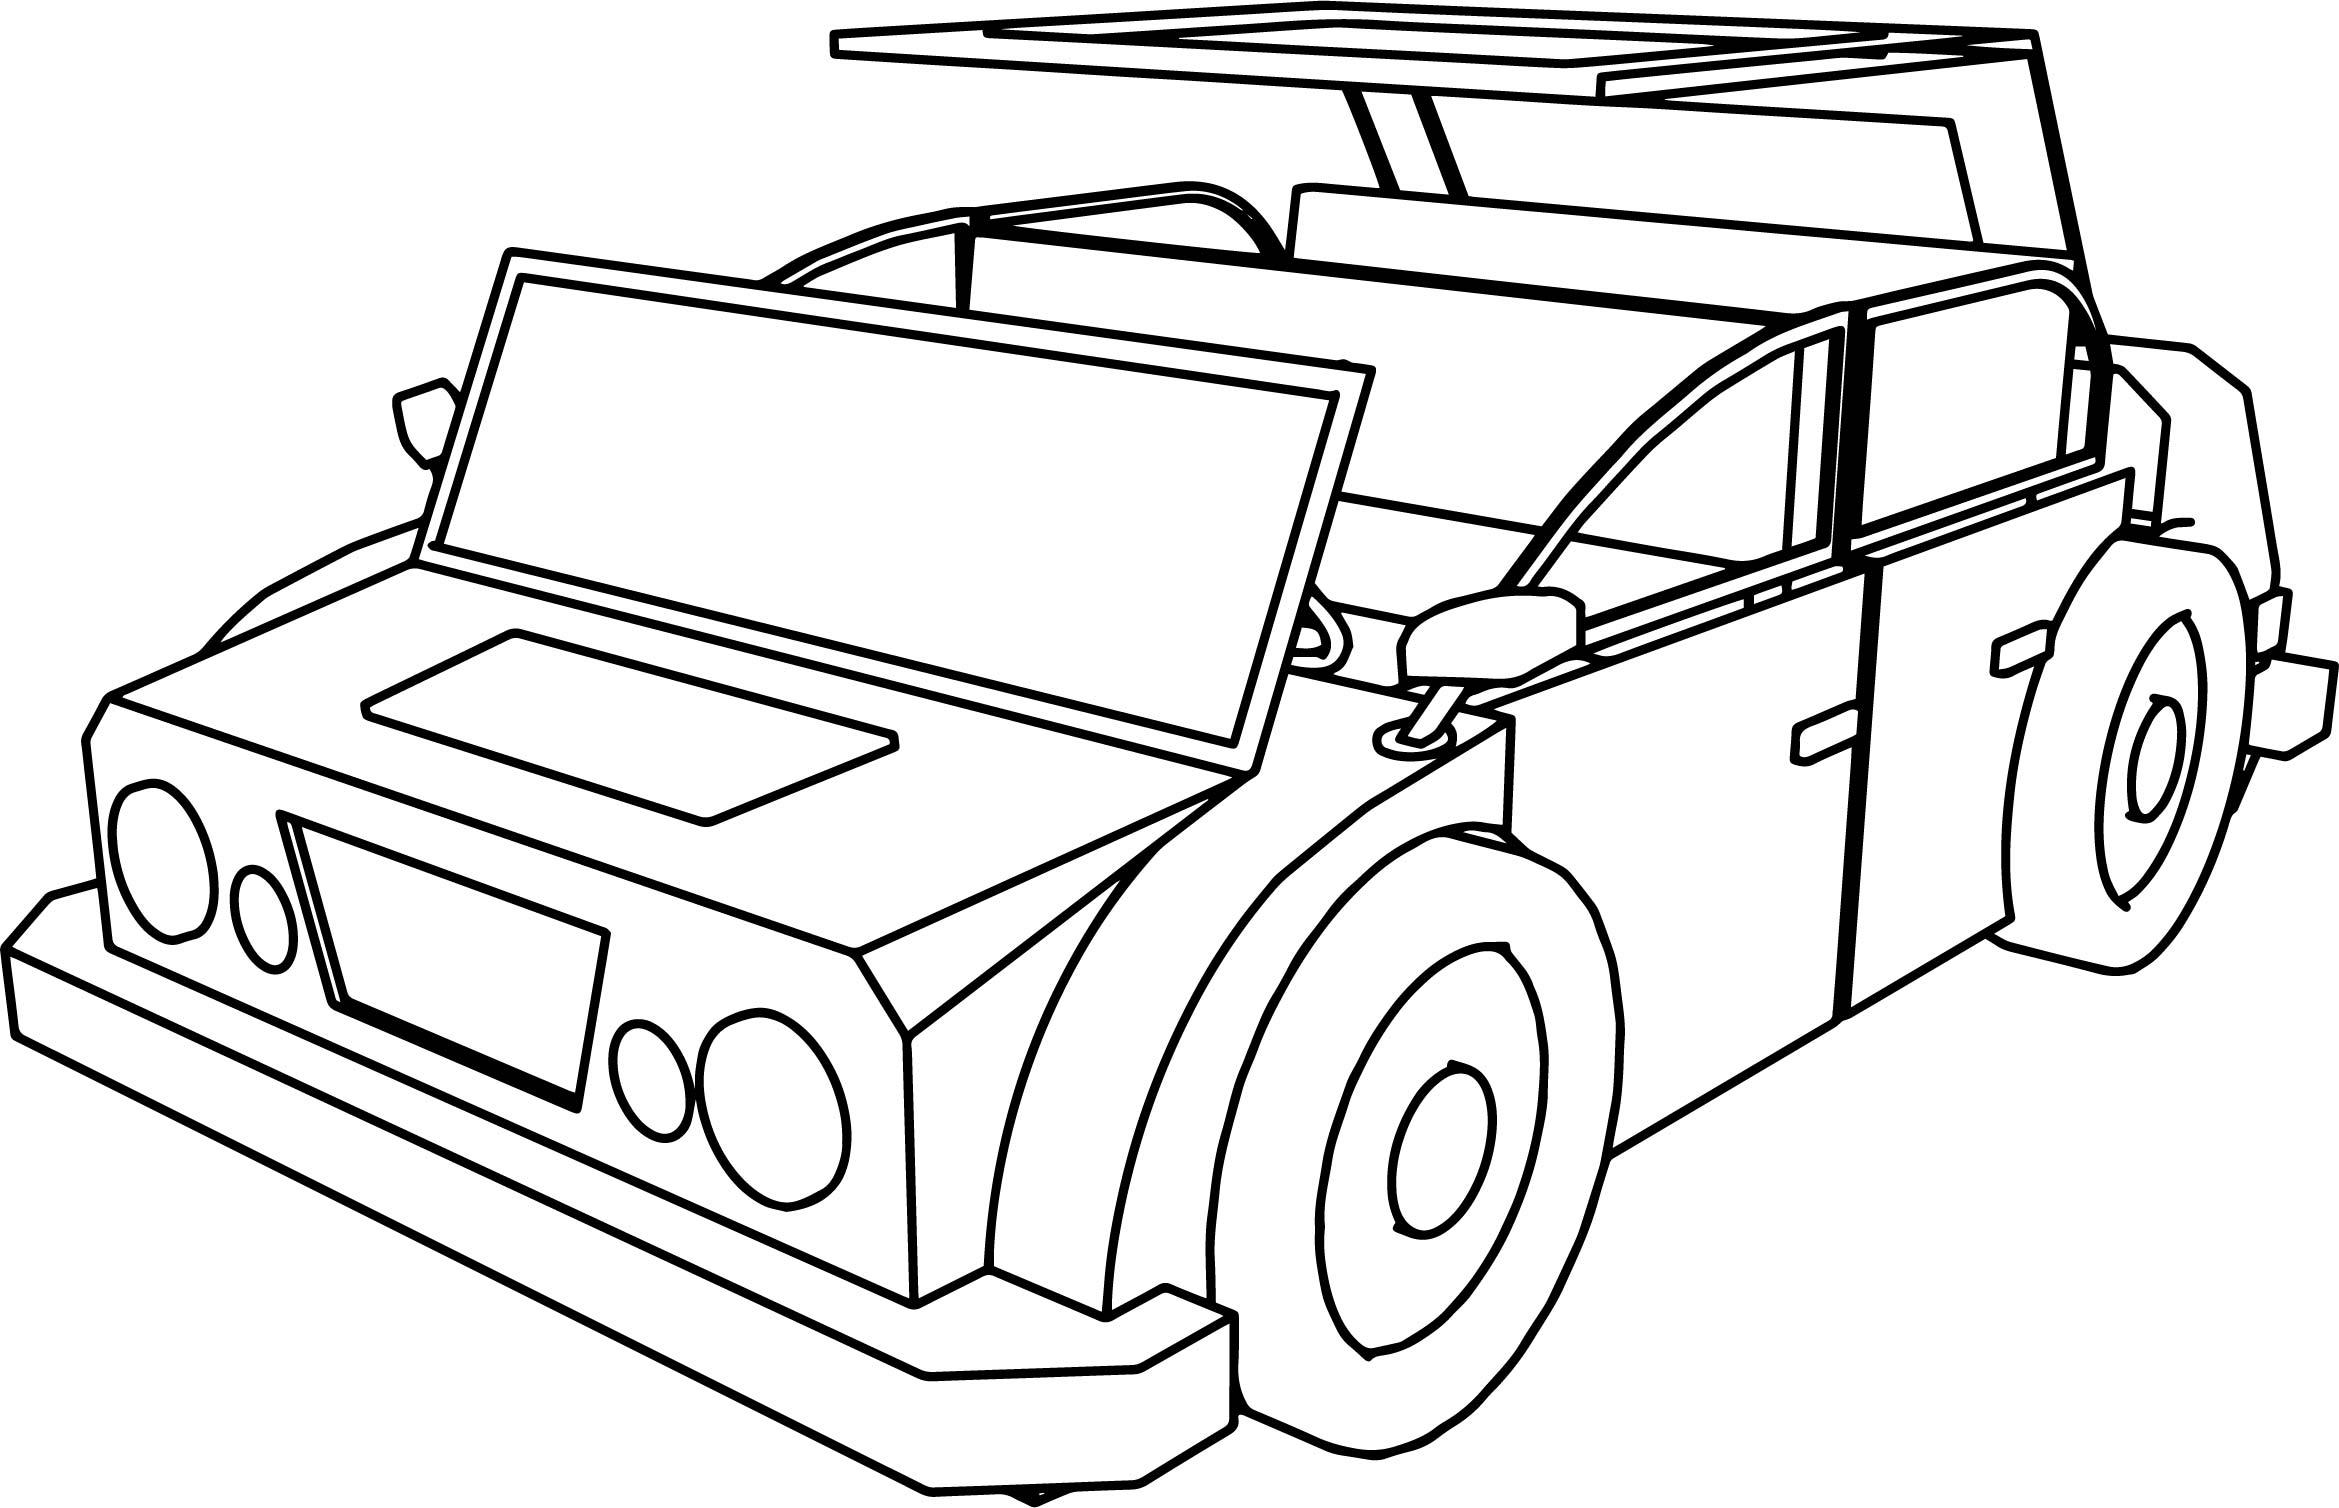 Hq Holden Ute Wiring Diagram